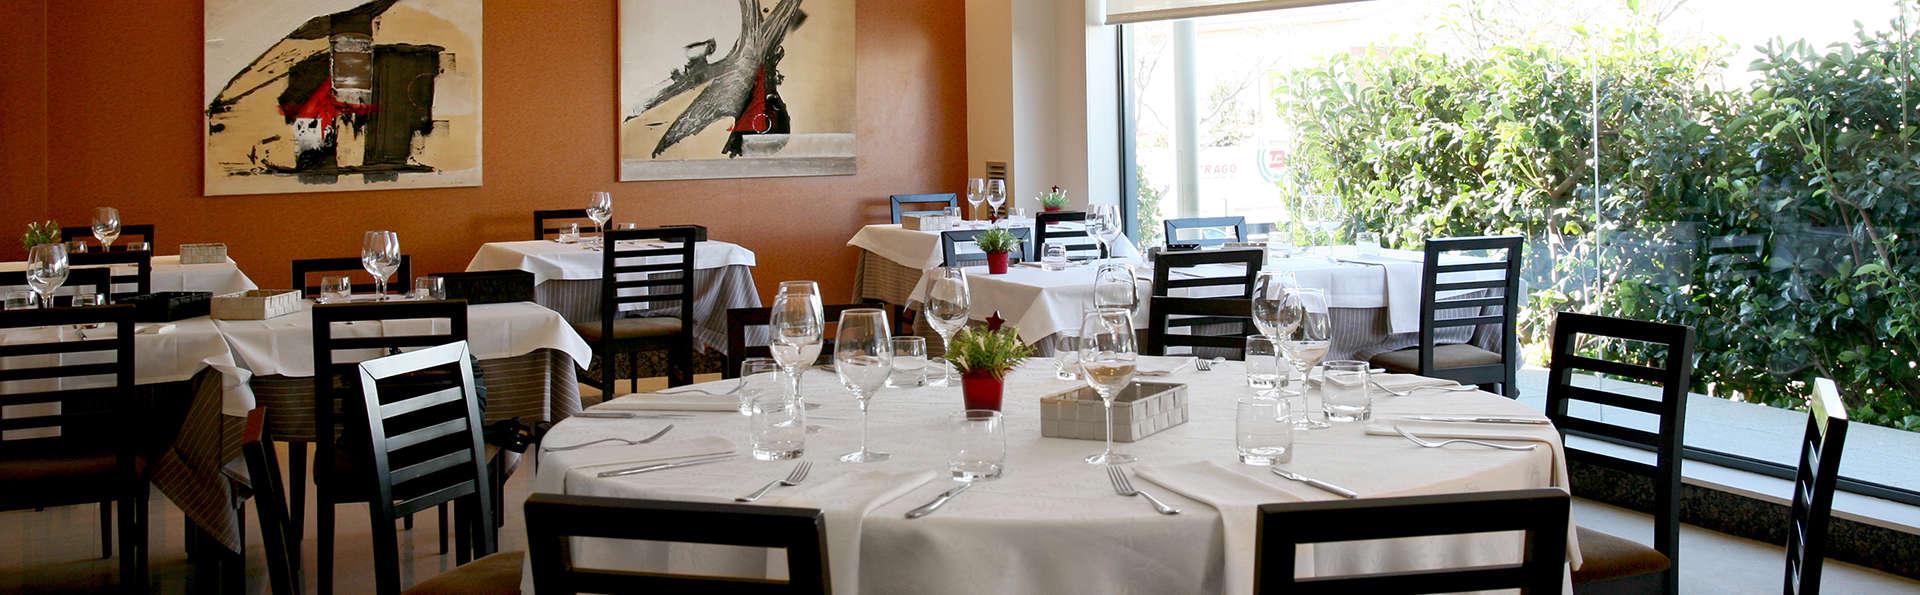 Hotel Class - EDIT-restaurant2.jpg